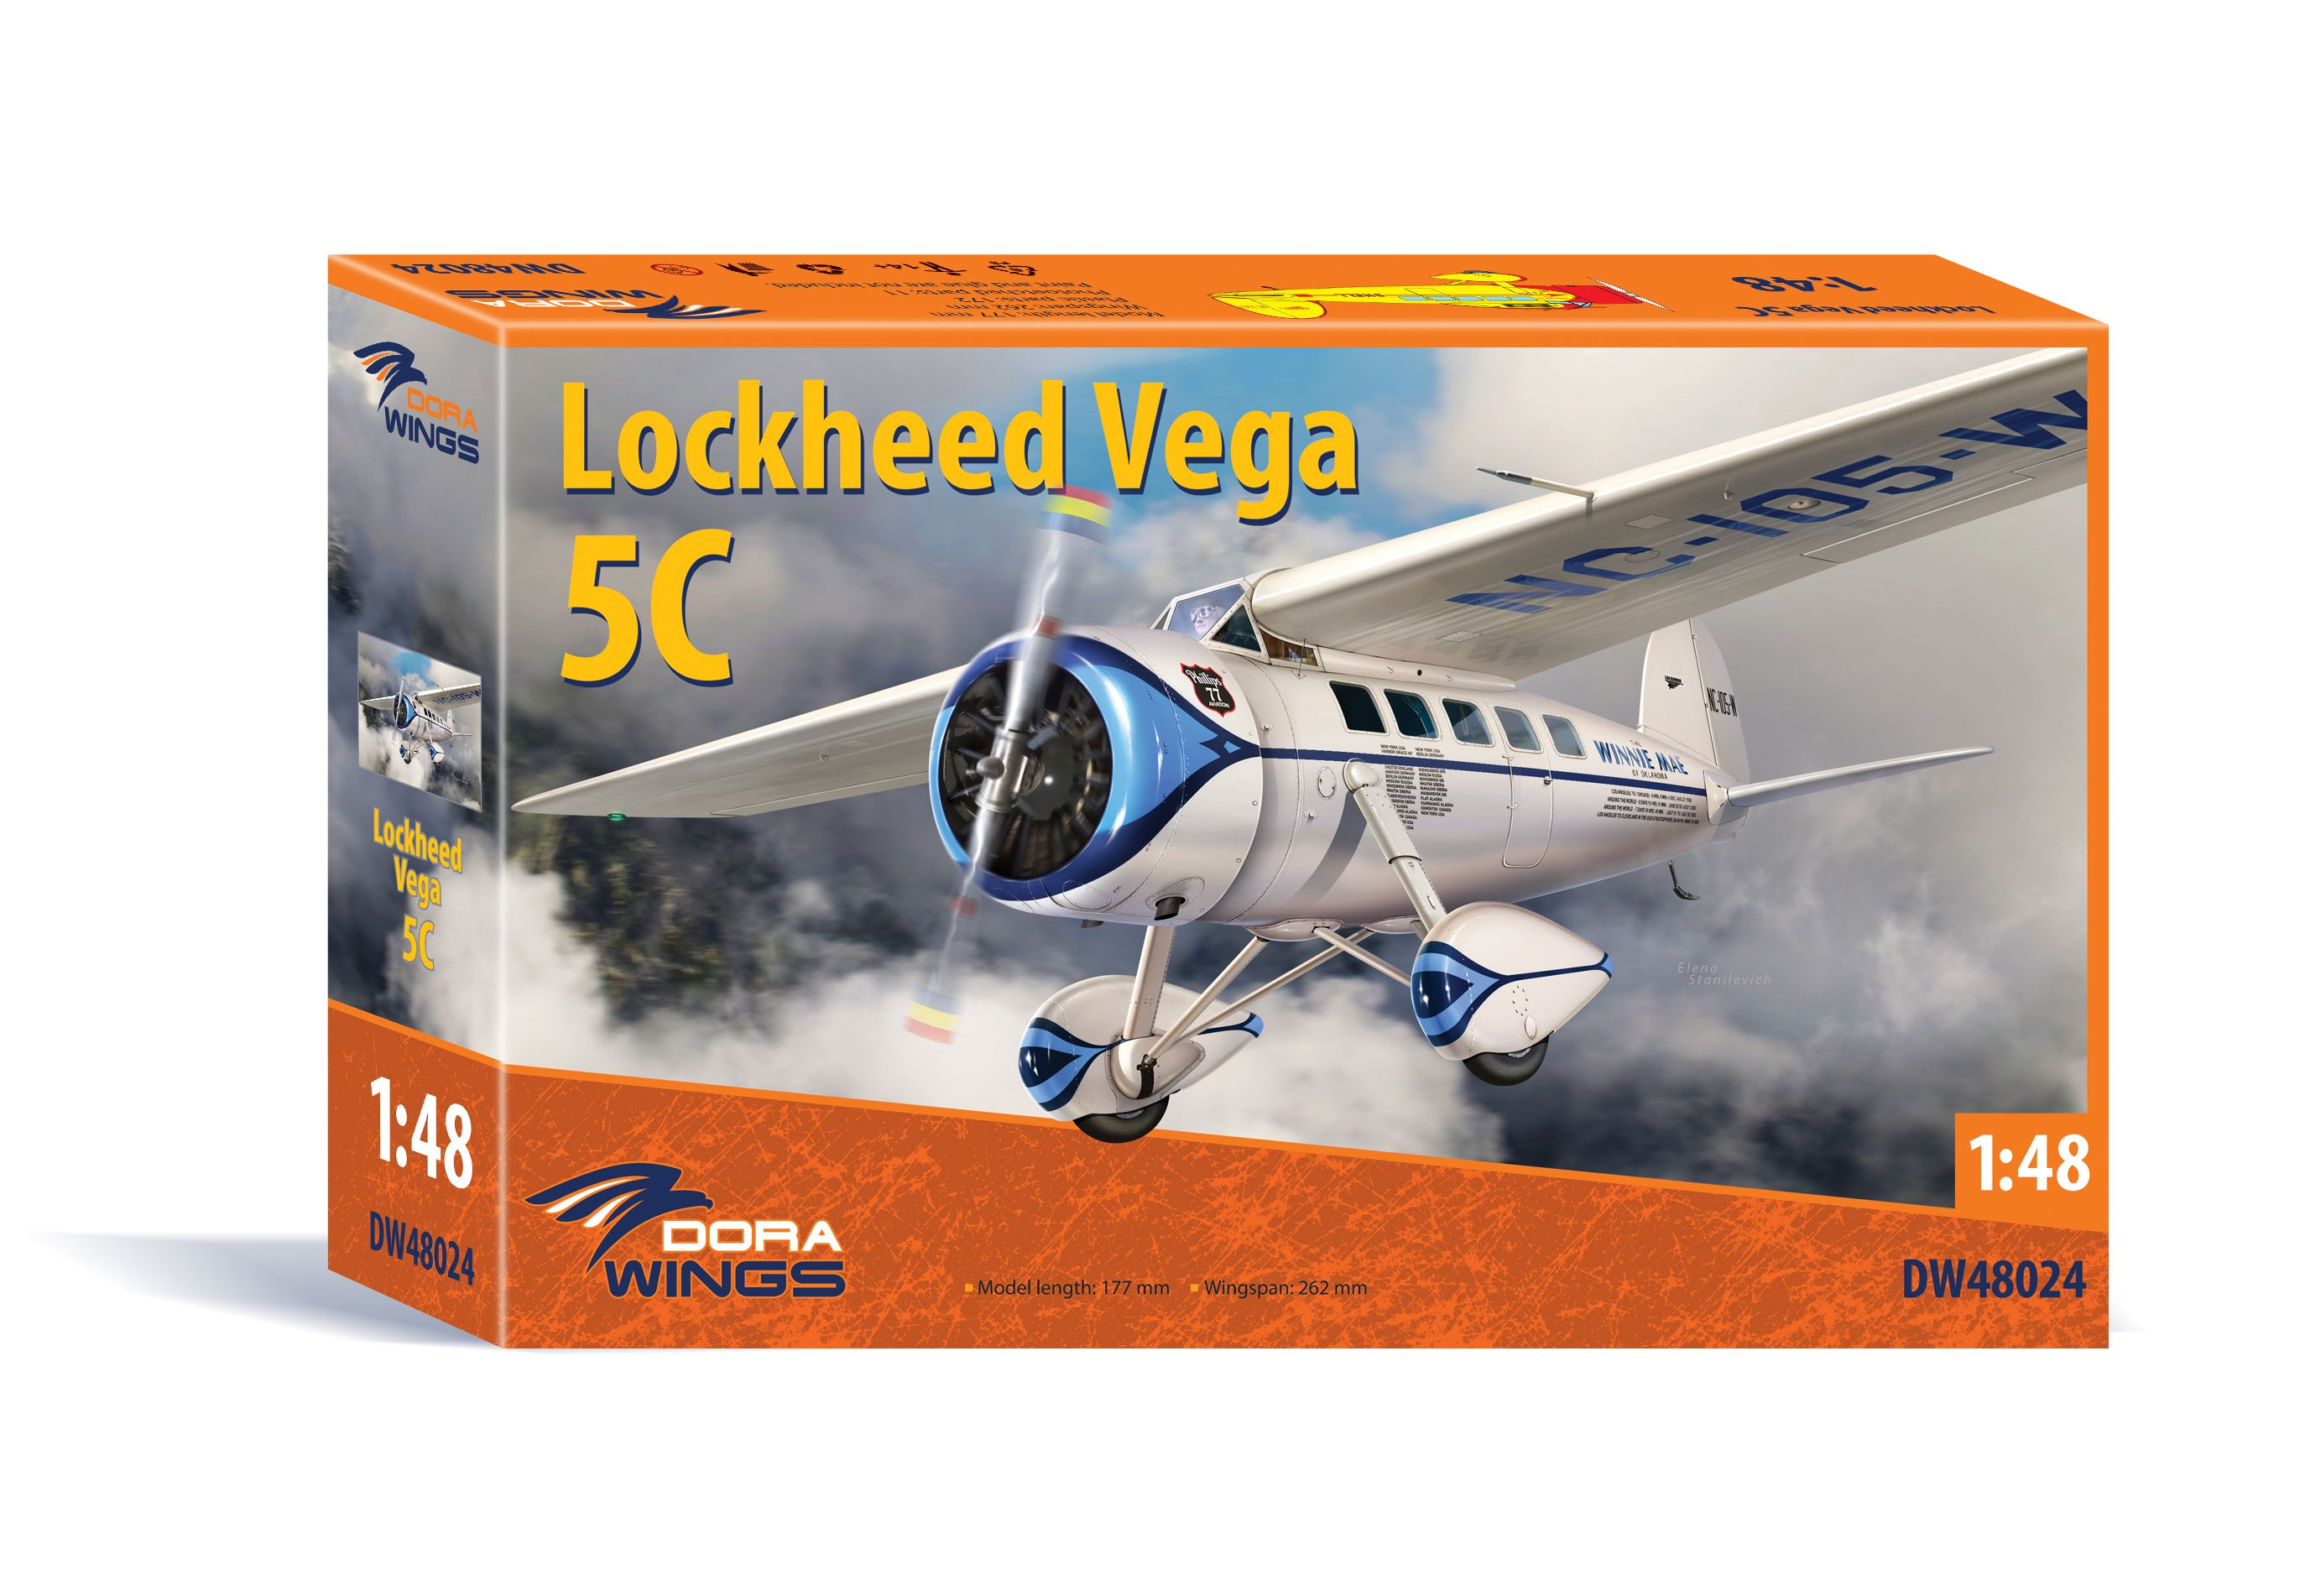 Dora Wings 1/48 Scale Lockheed Vega 5C